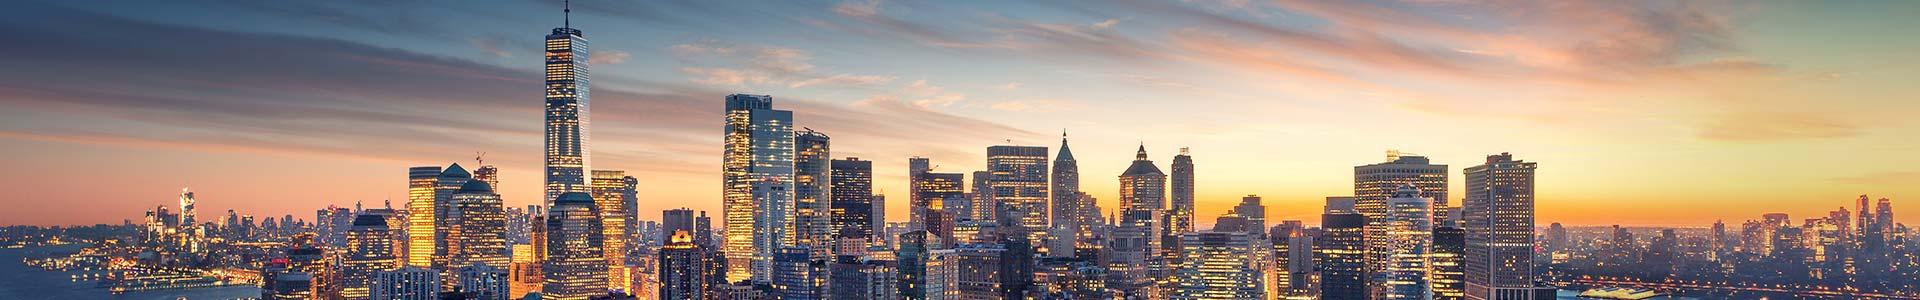 new-york-essenziale-testata